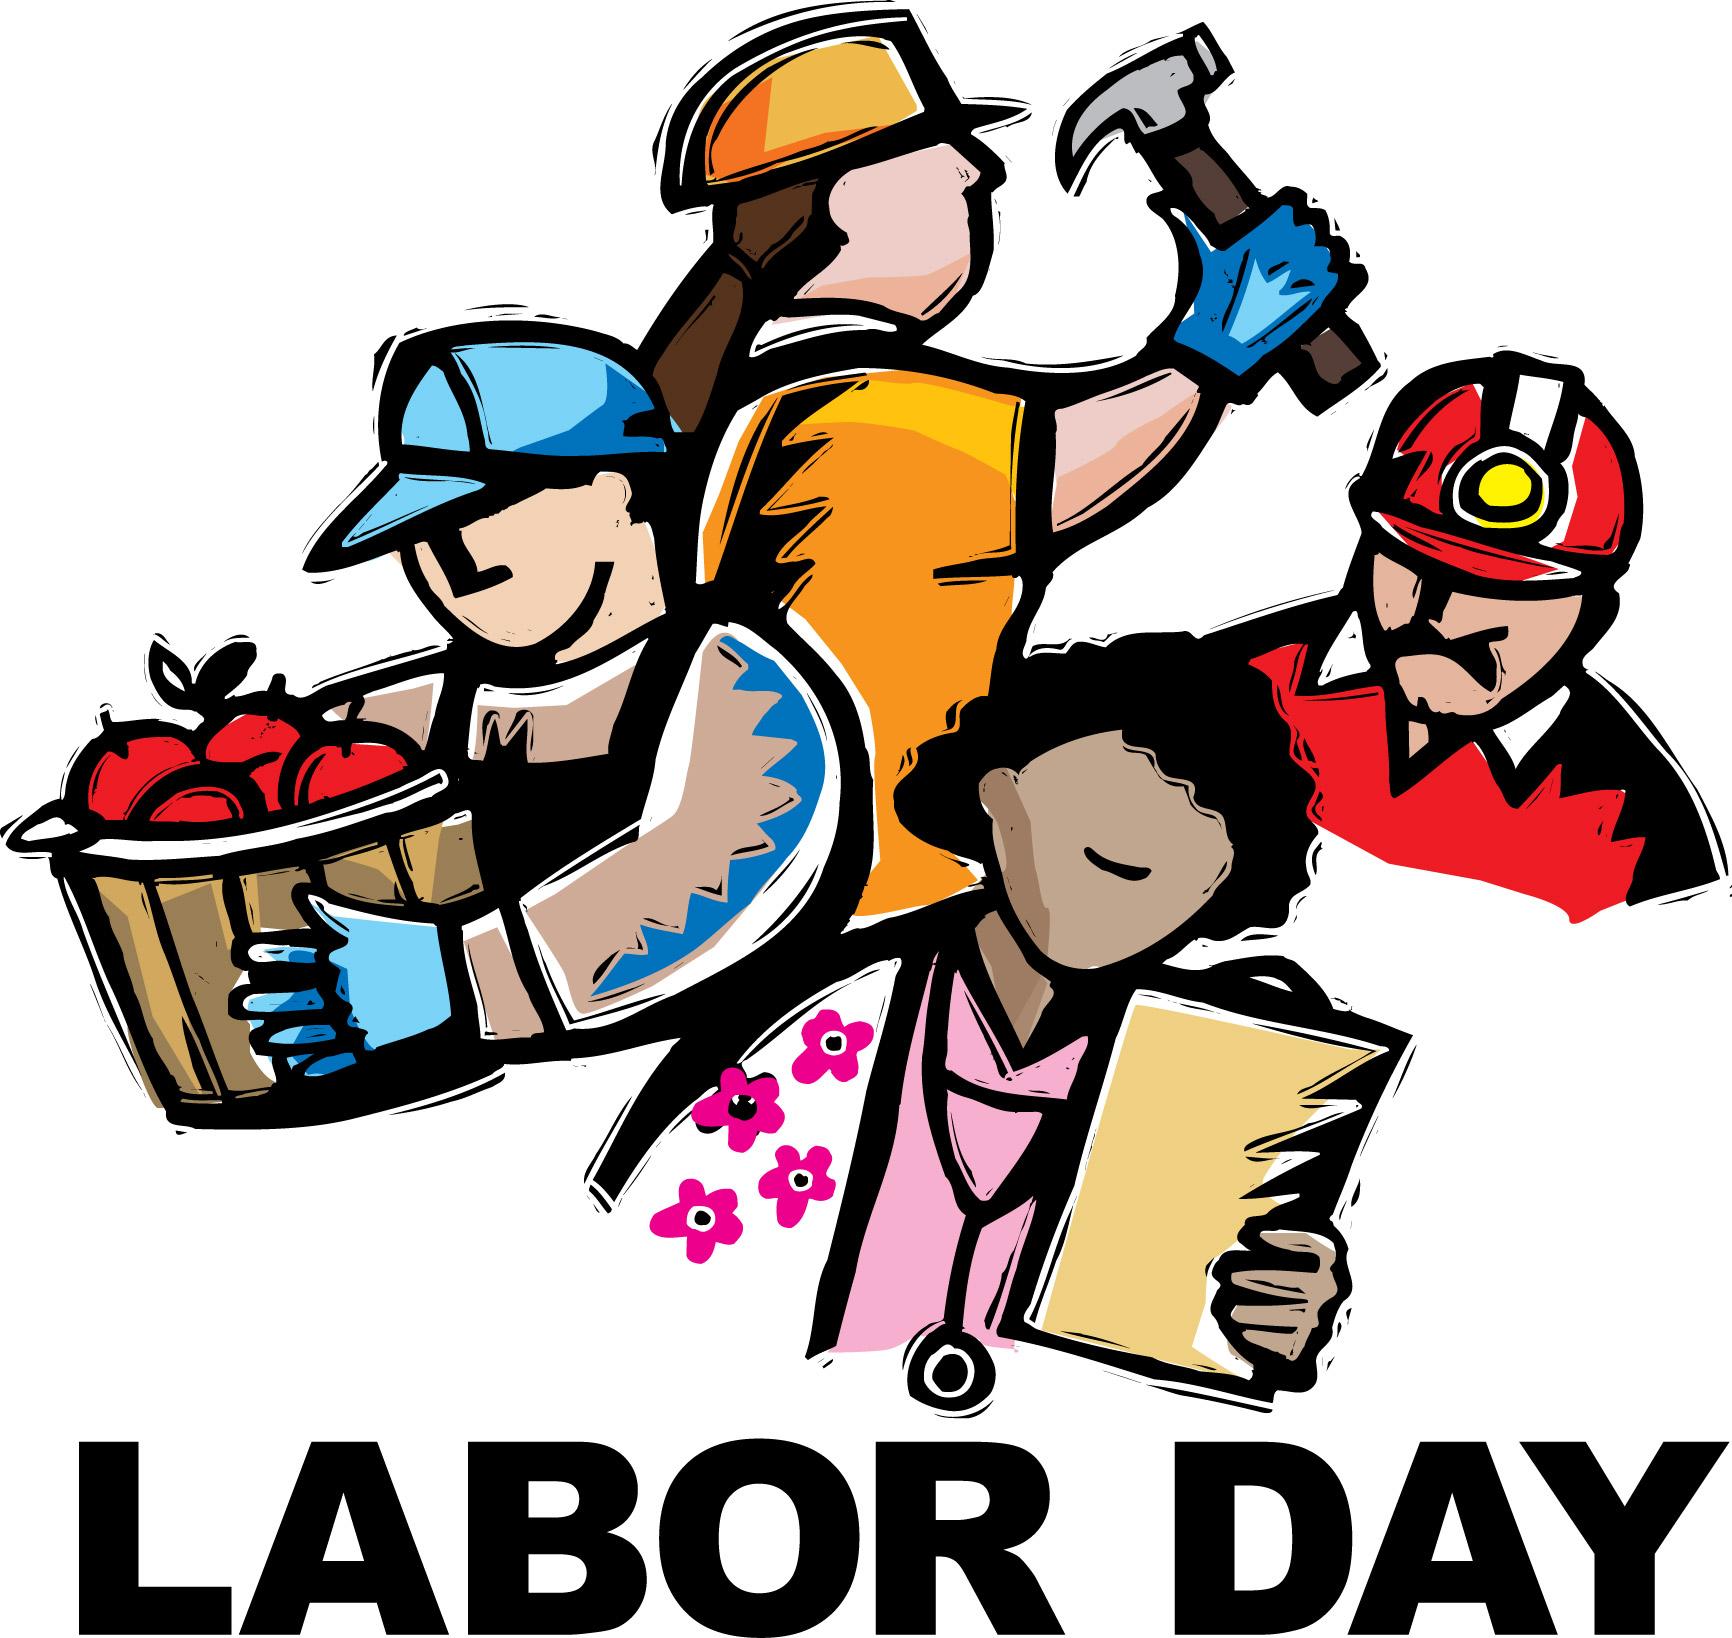 Labor Day Picnic Clip Art Pictures-Labor Day Picnic Clip Art Pictures-2